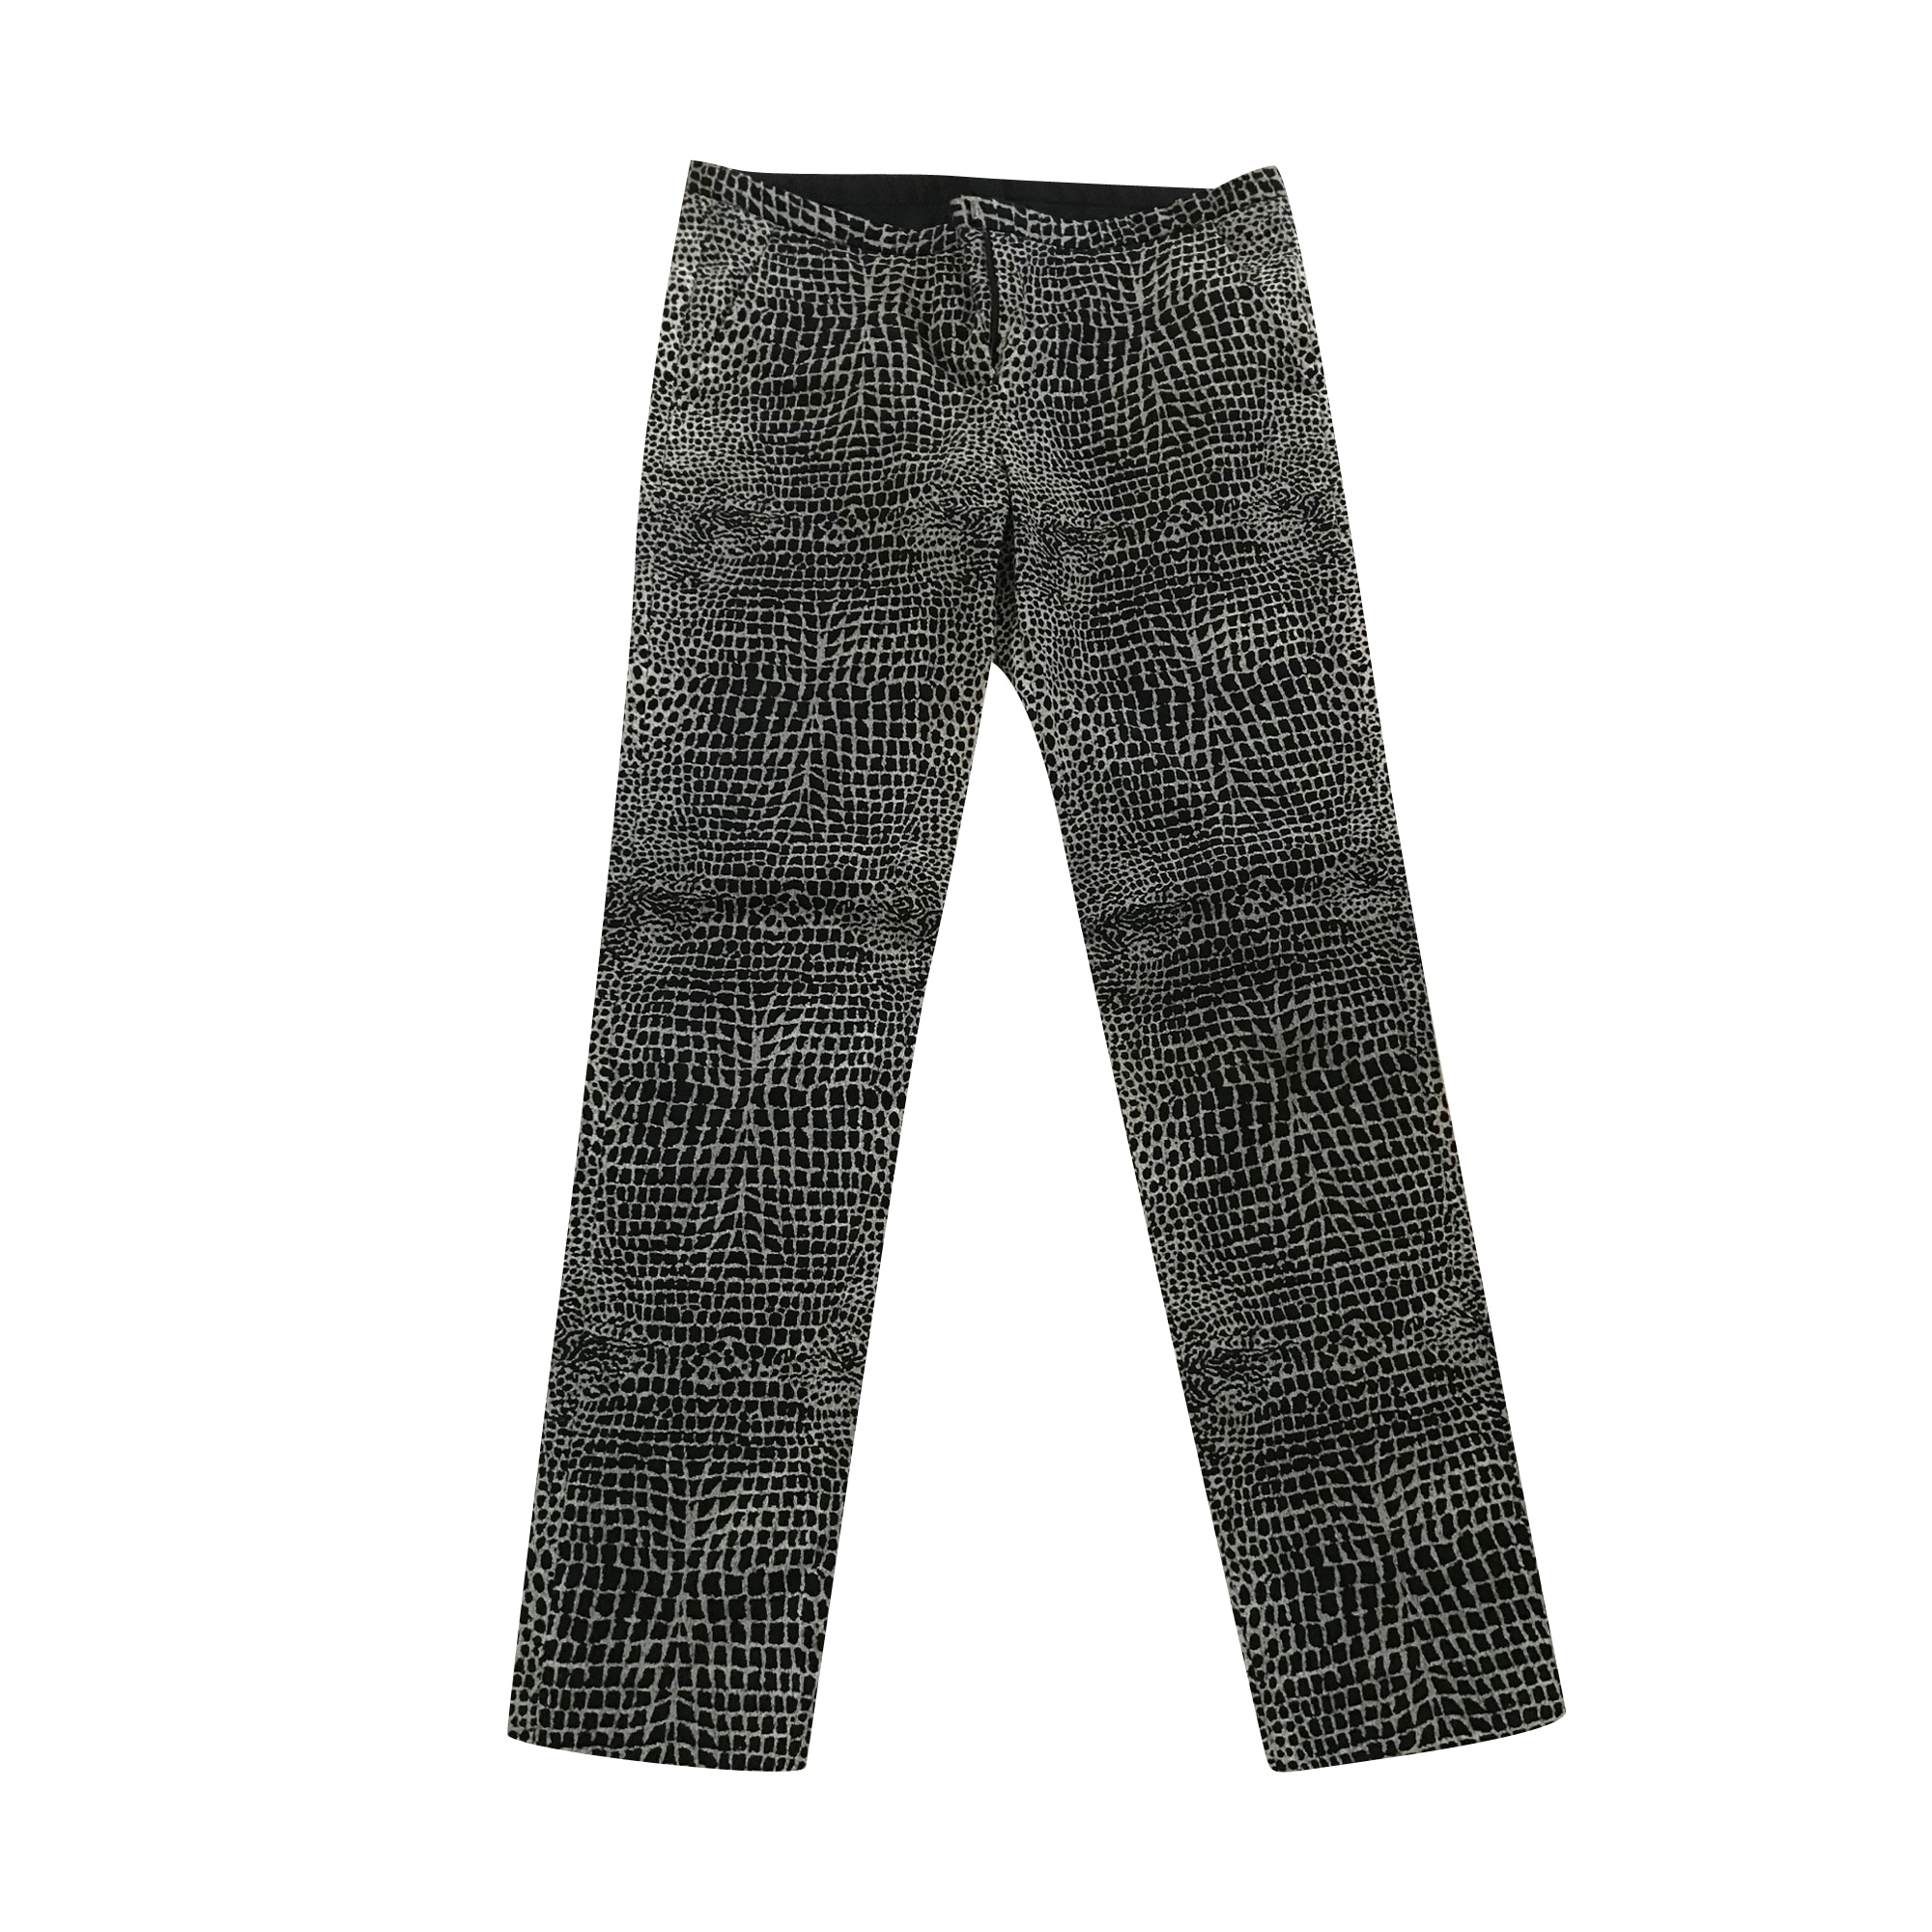 Pantalon slim, cigarette THE KOOPLES Noir